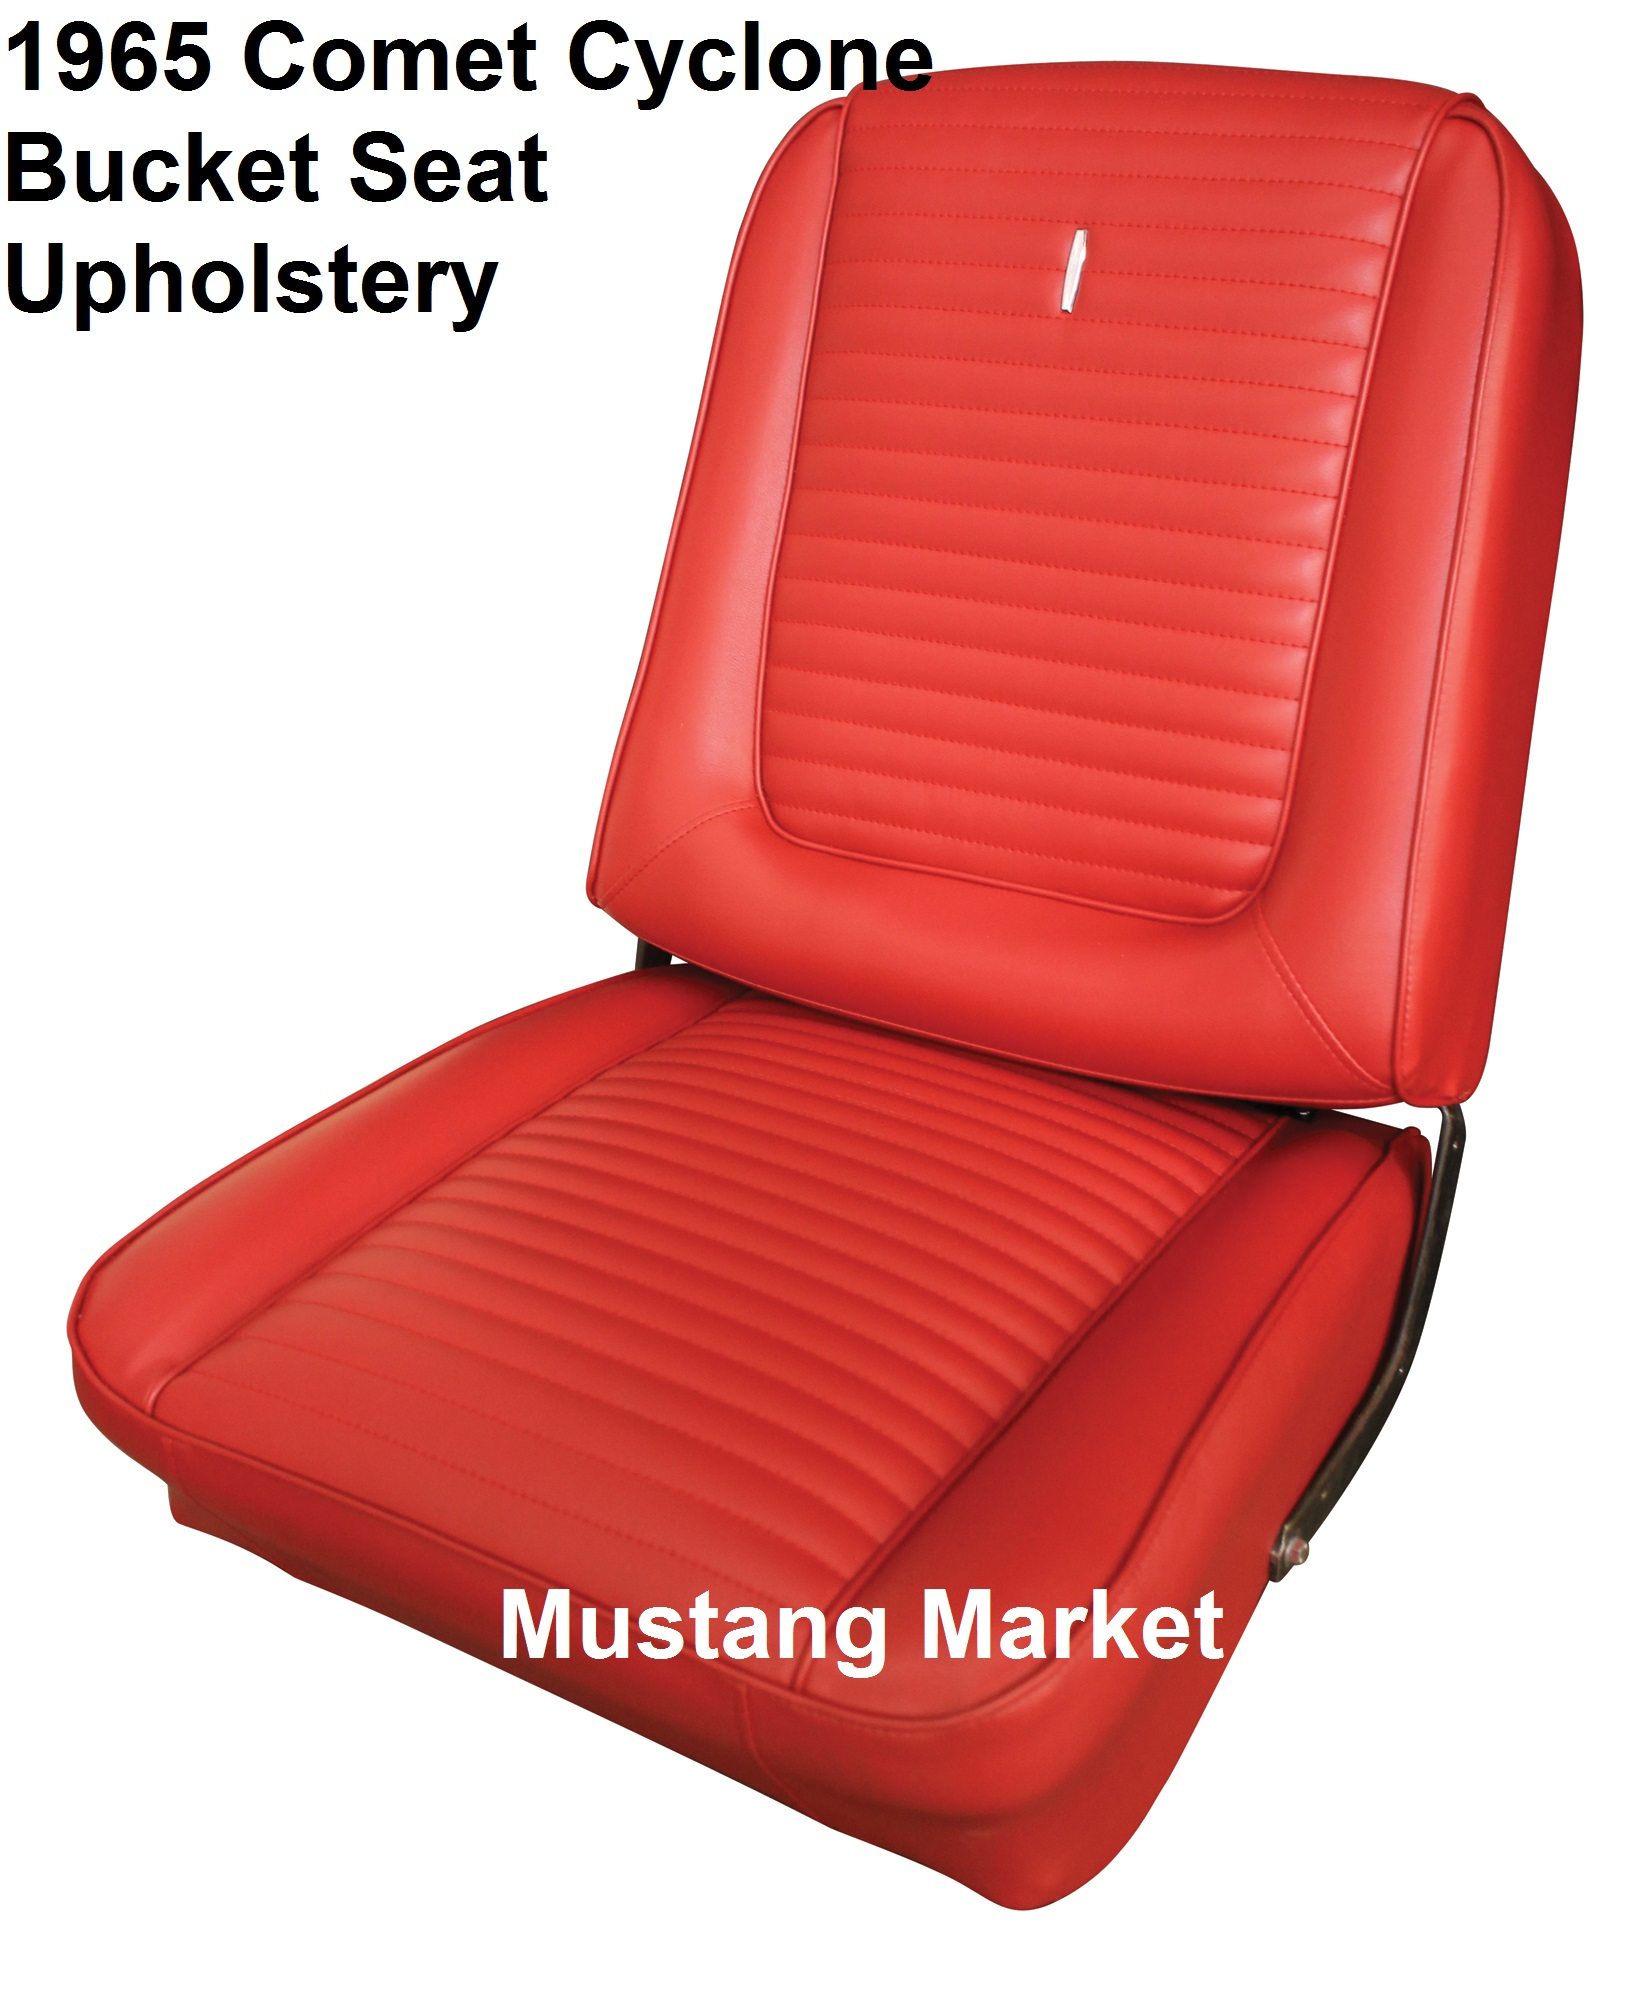 1965 65 et cyclone Bucket Seat Upholstery